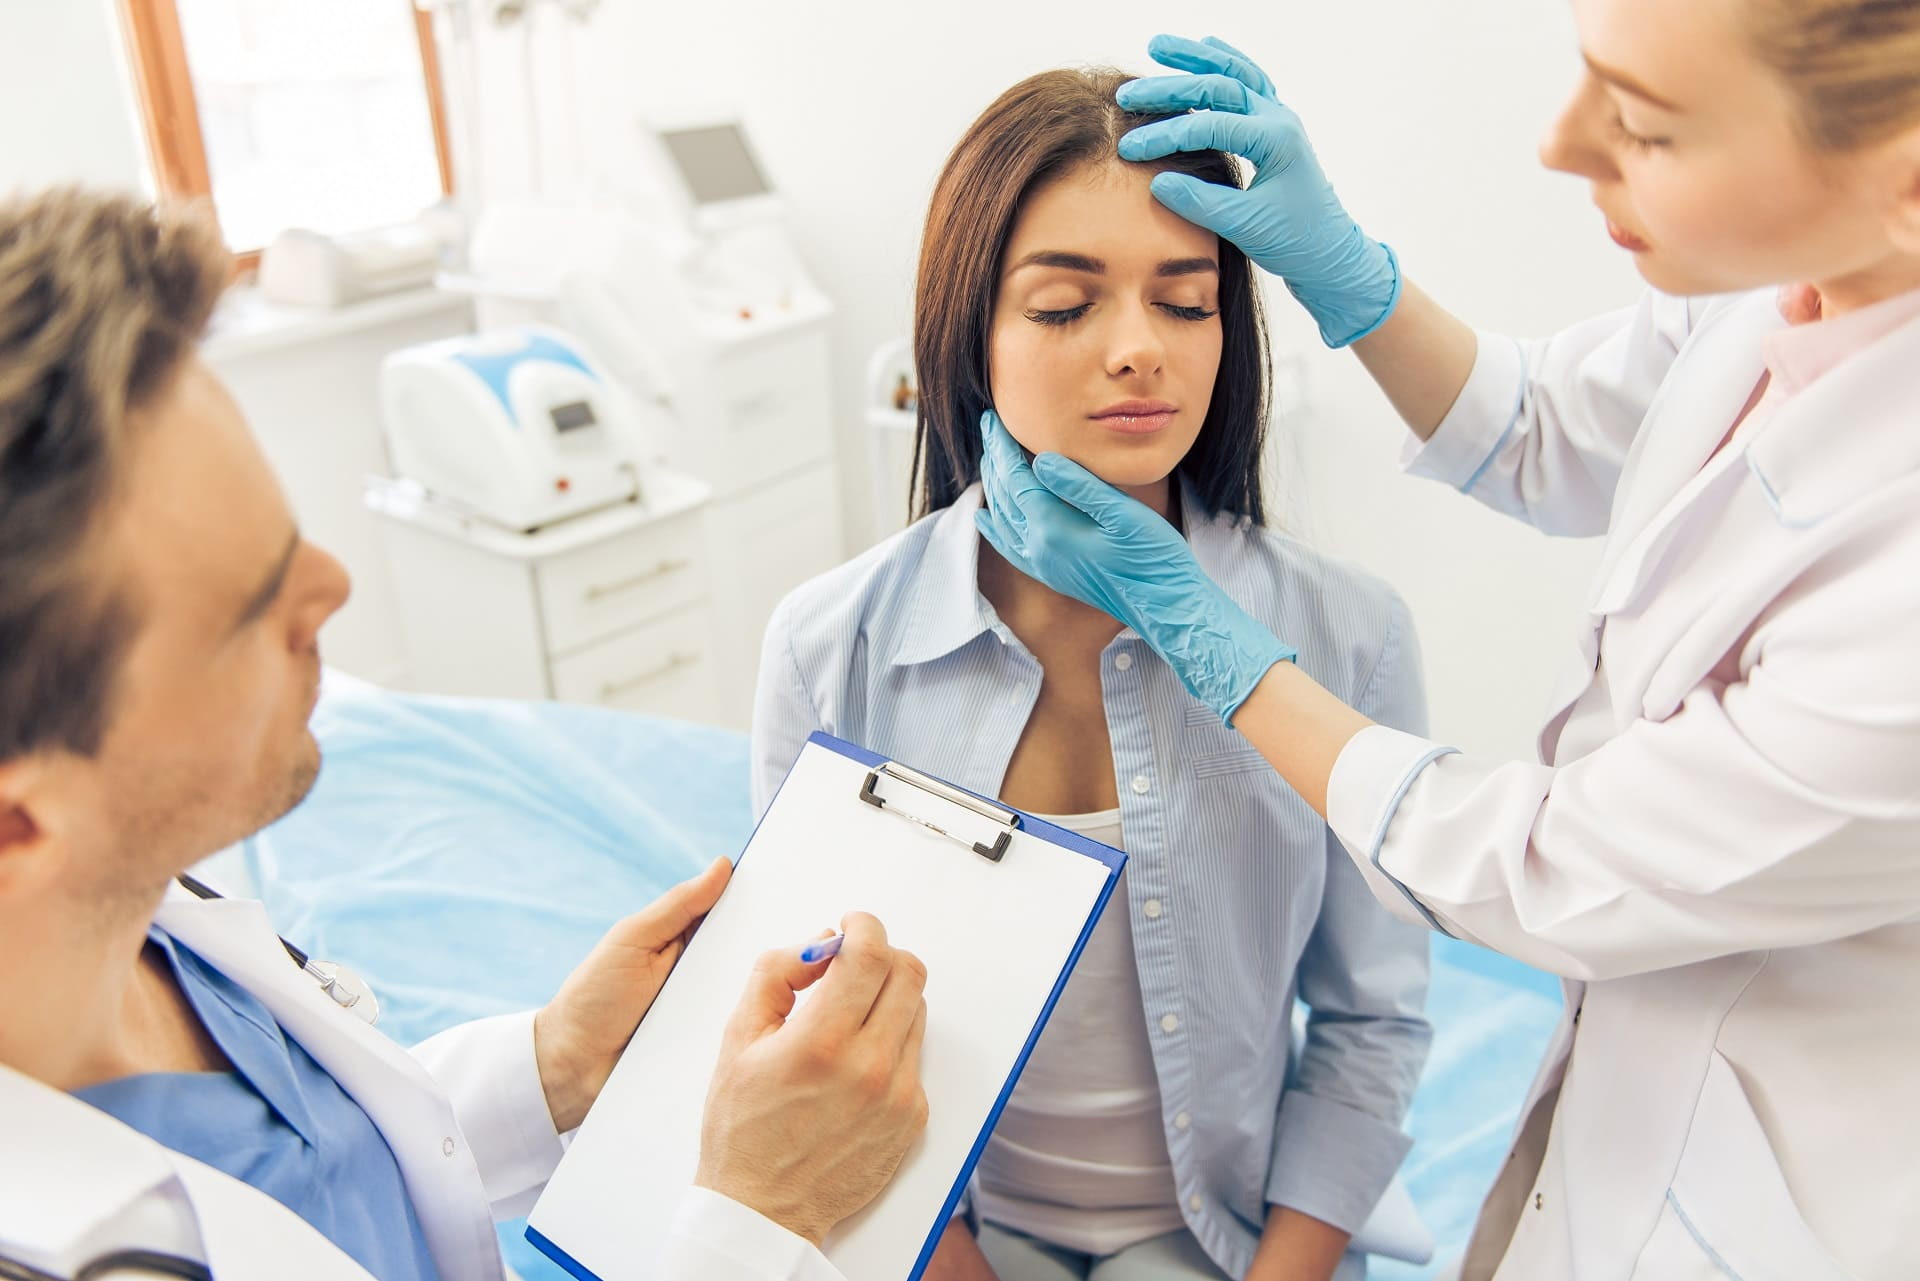 Plastic Surgery at Quirónsalud Hospitals in Spain